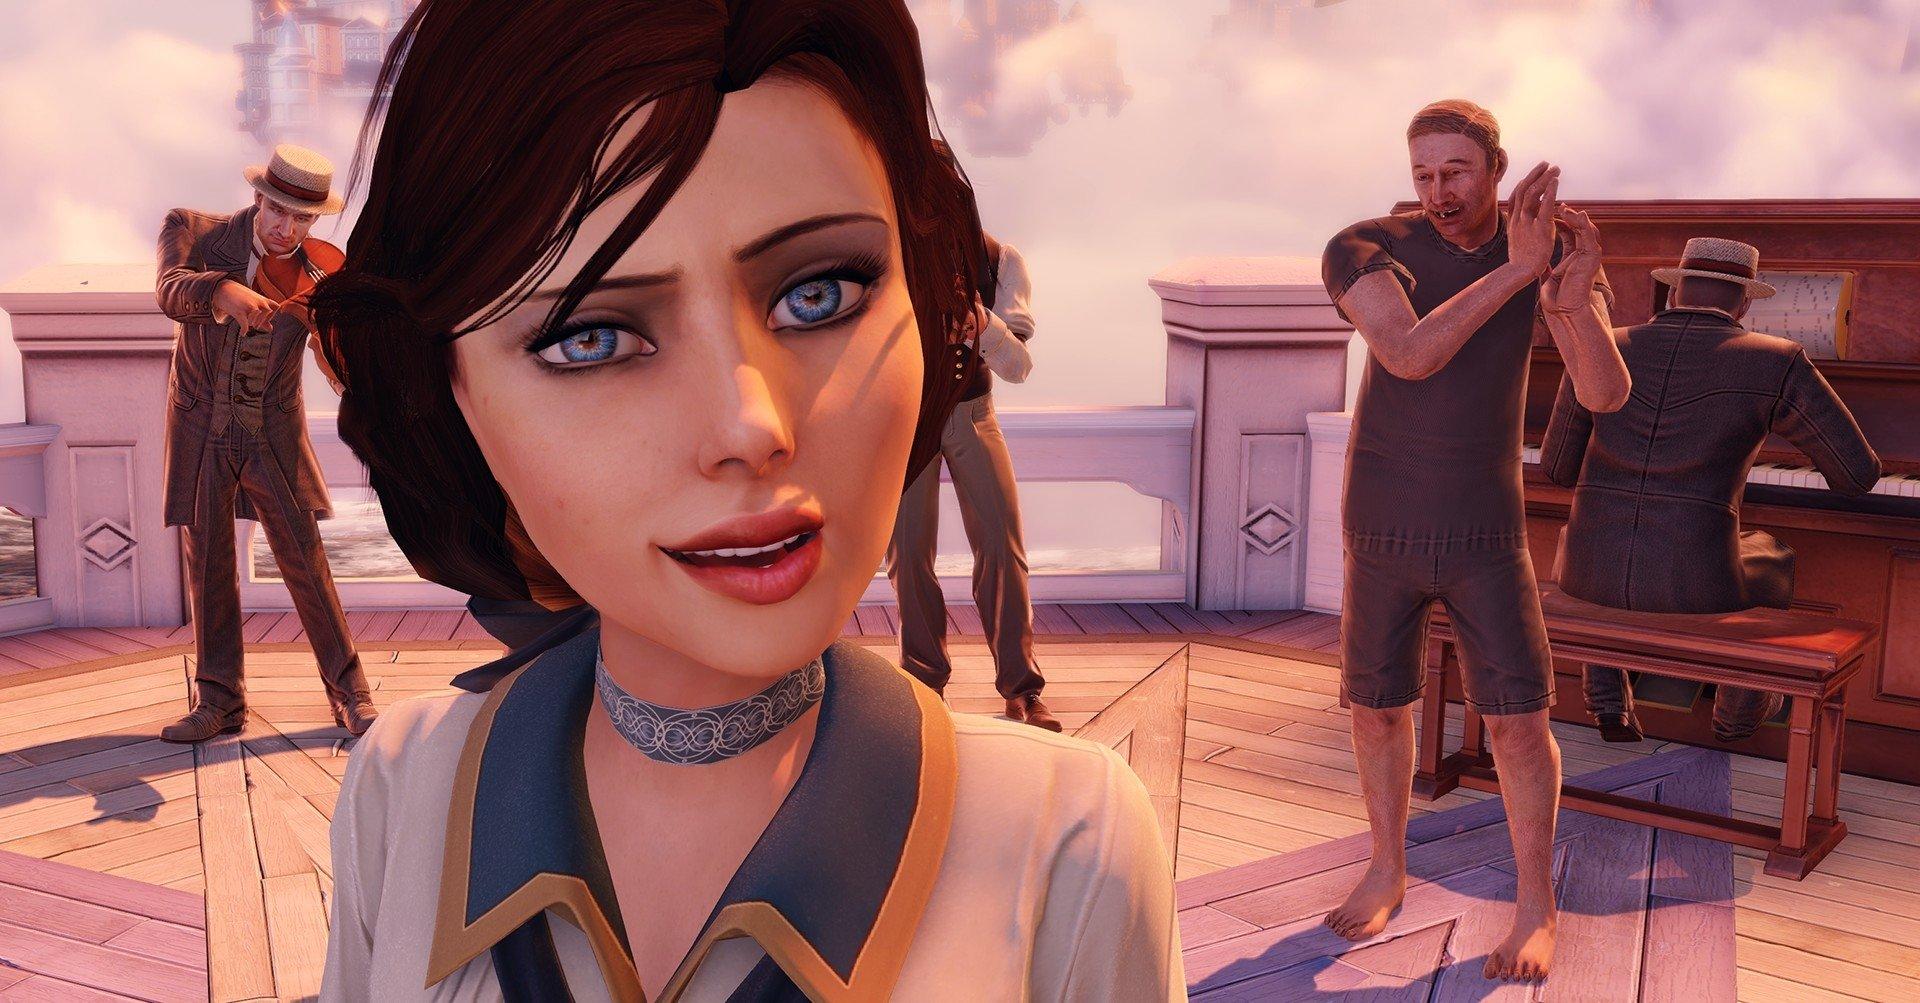 Video Game - Bioshock Infinite  Elizabeth (Bioshock Infinite) Wallpaper